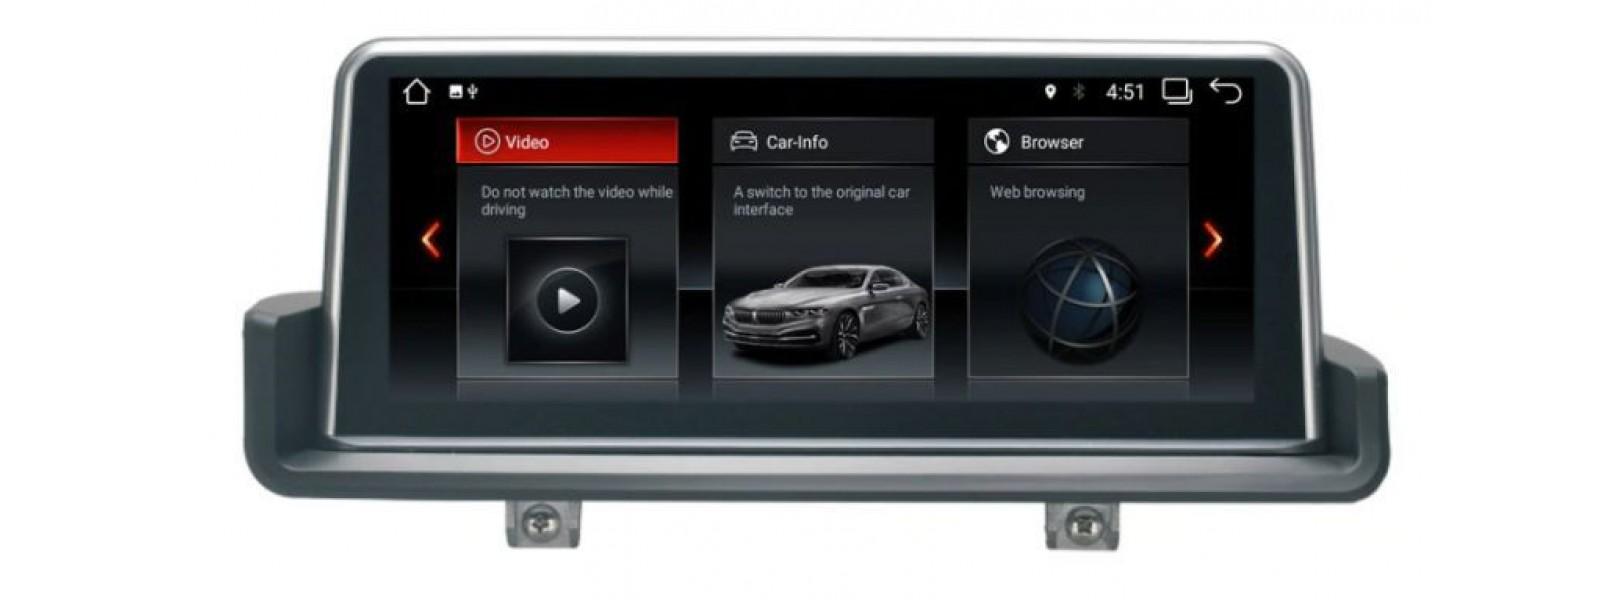 BMW BMW 3 Series E90 / E91 / E92 / E93 10.25инча - Навигация Андроид 9.1